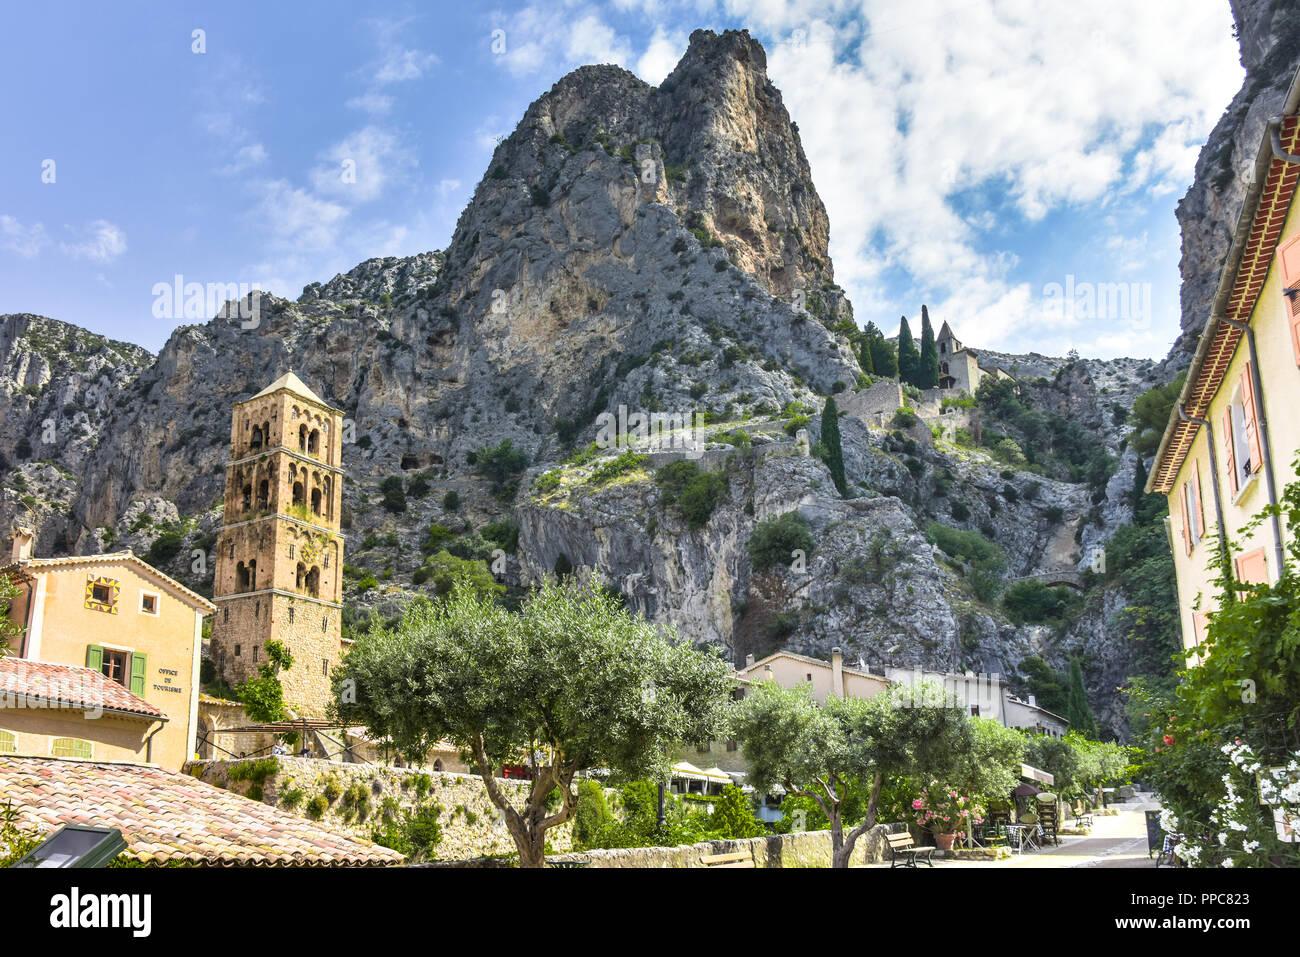 village Moustiers-Sainte-Marie, Provence, France, member of most beautiful villages of France, department Alpes-de-Haute-Provence Stock Photo